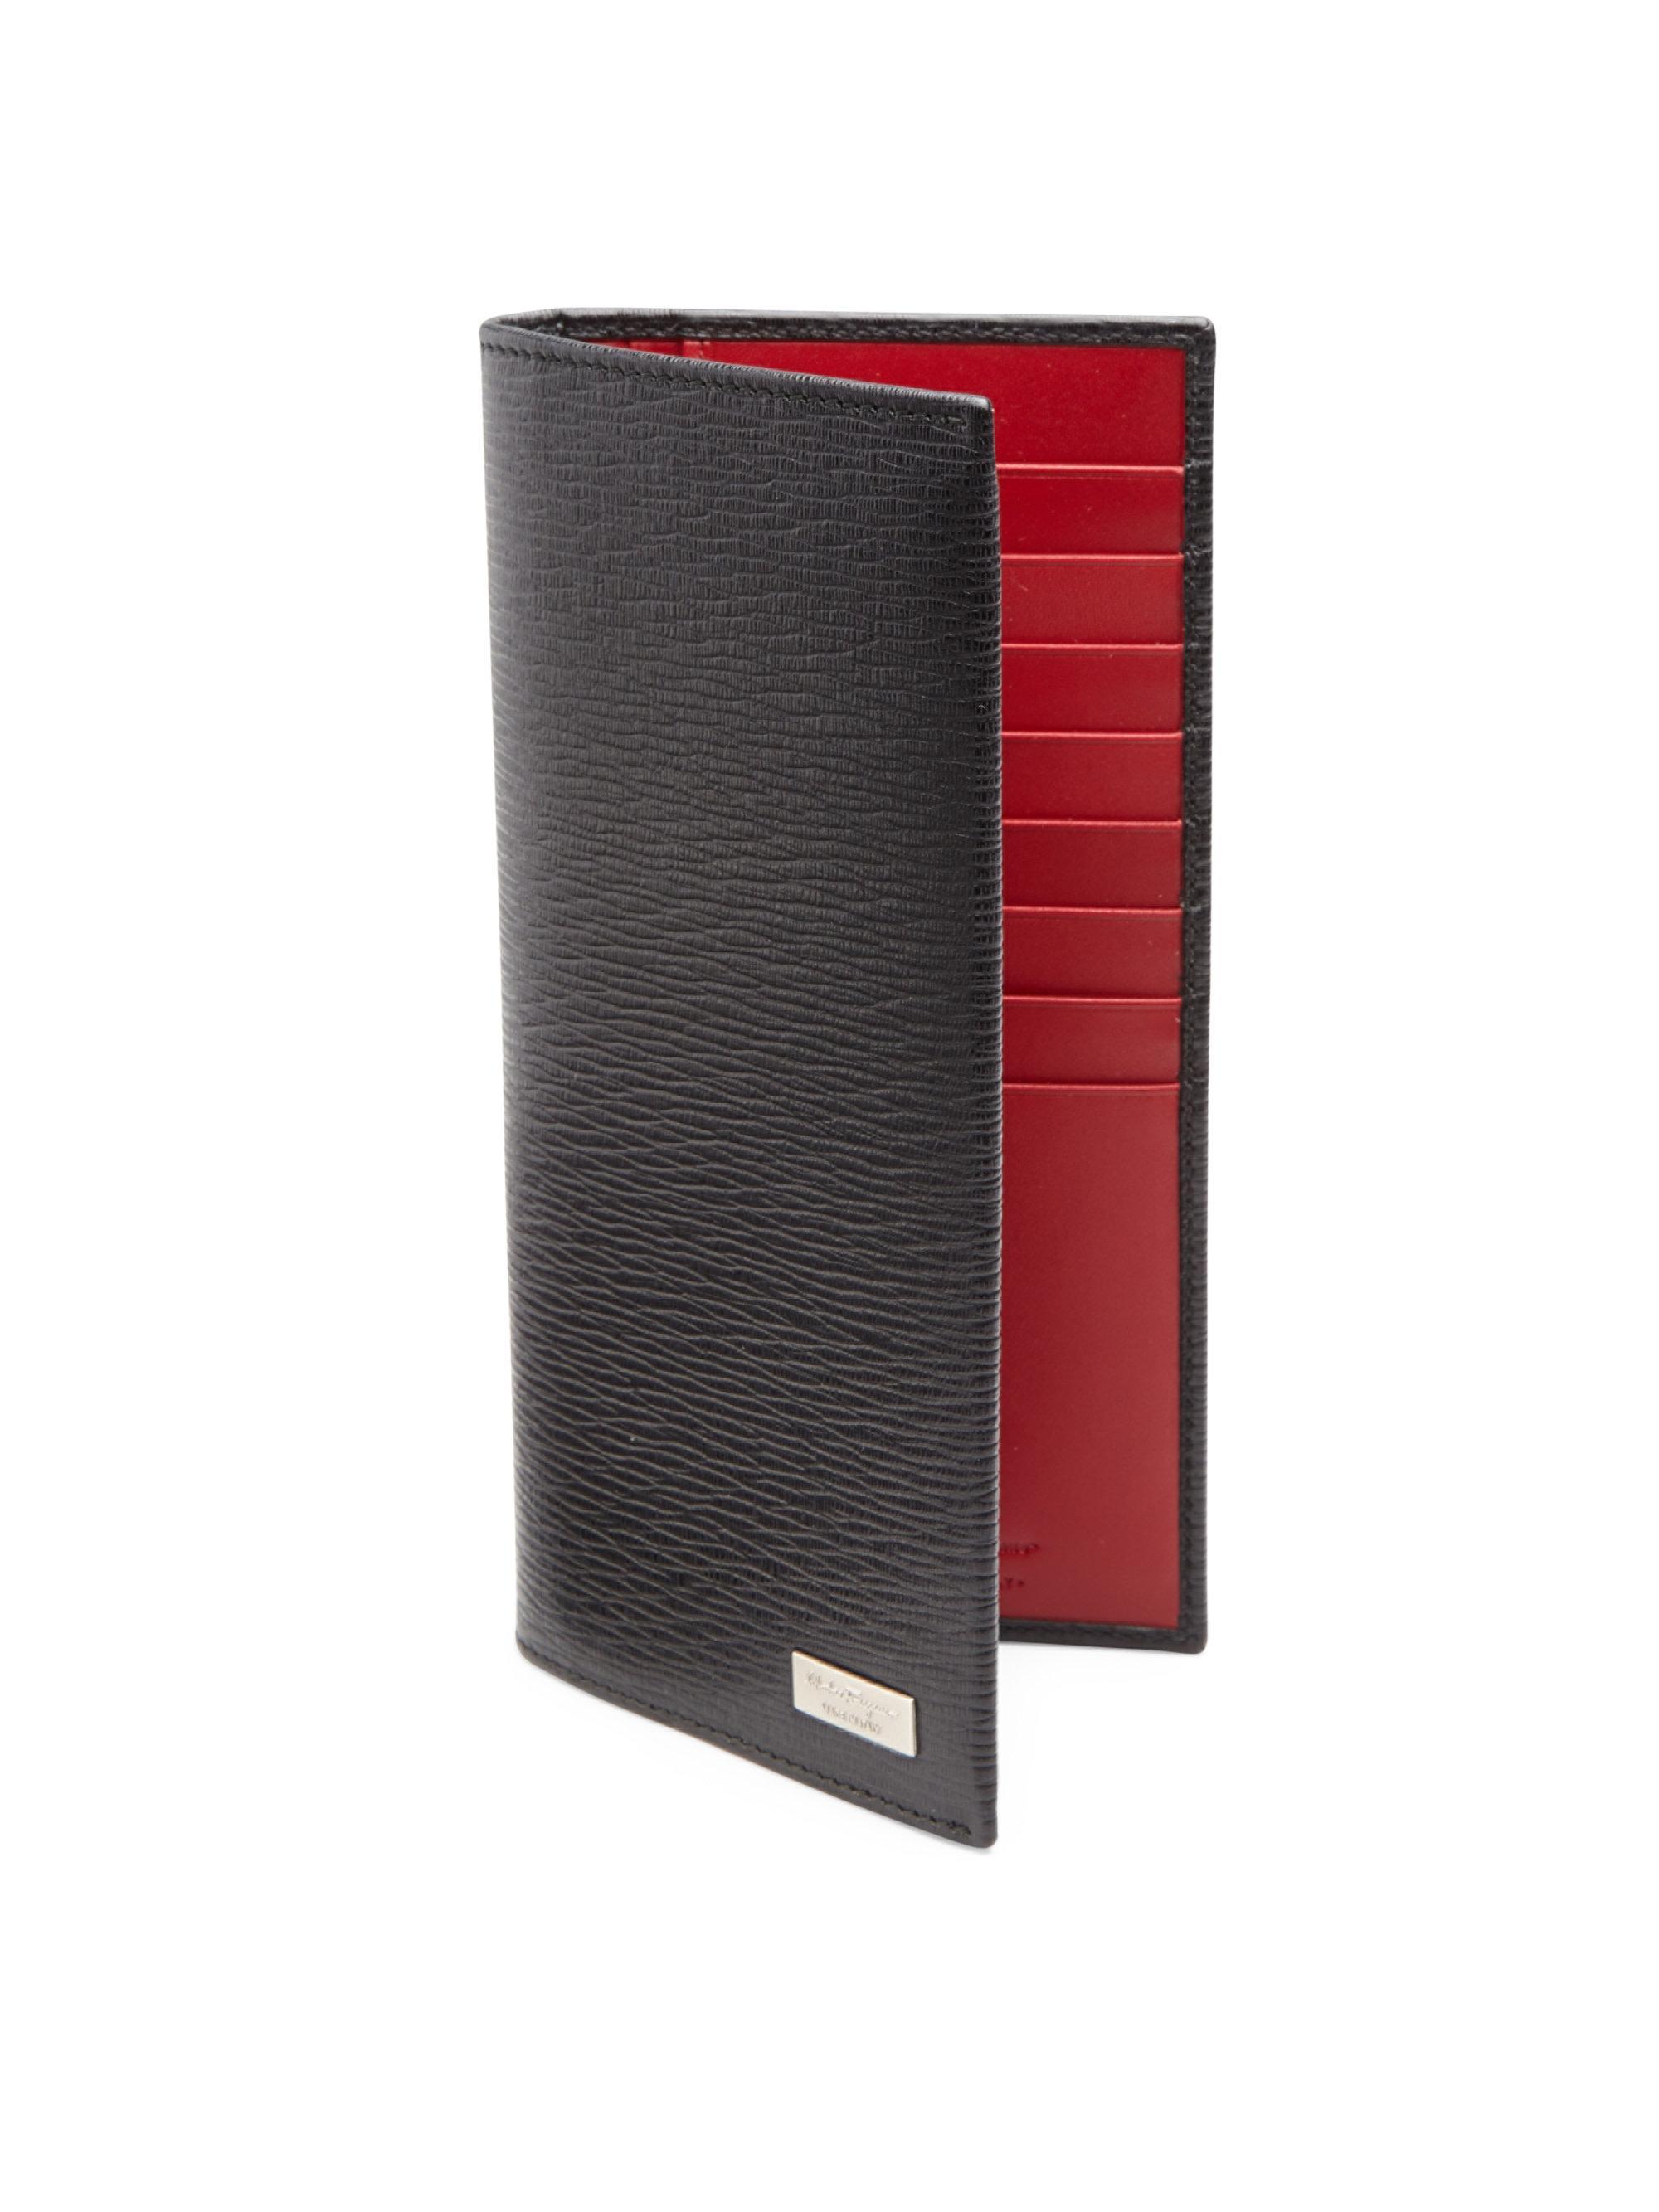 70075d96fd70 Ferragamo Embossed Leather Breast Pocket Wallet in Black for Men - Lyst